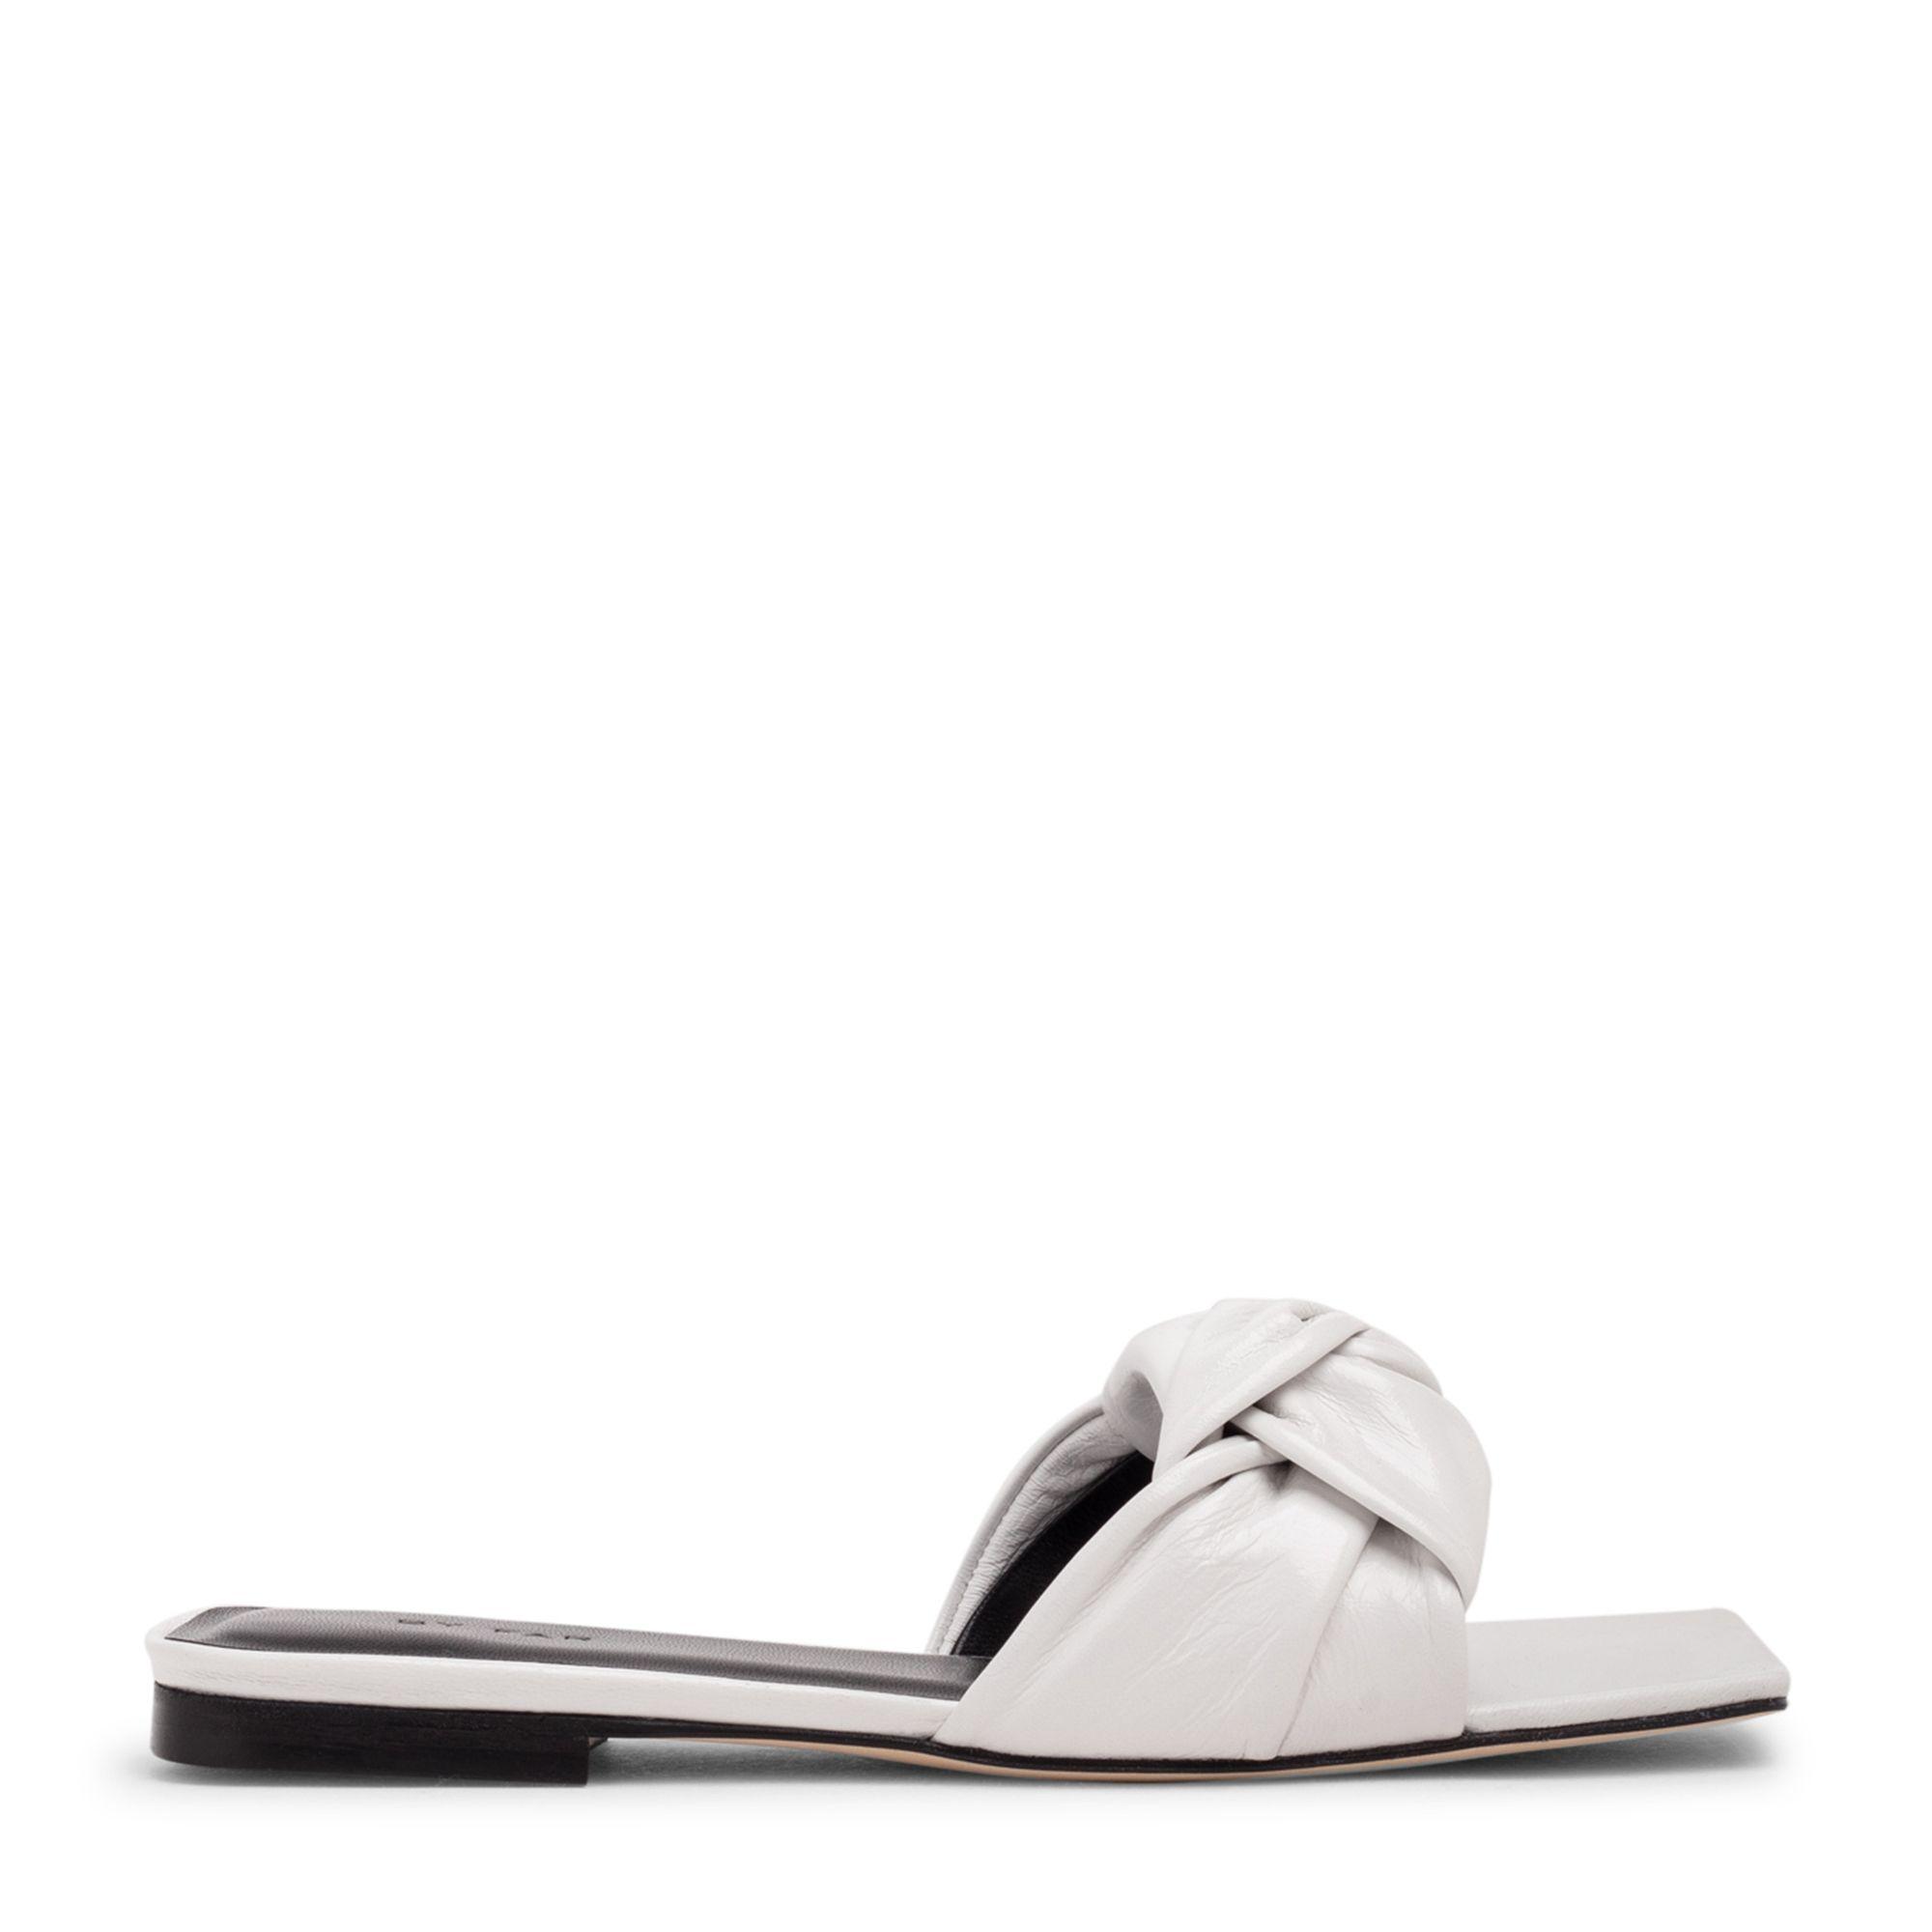 Lima sandals